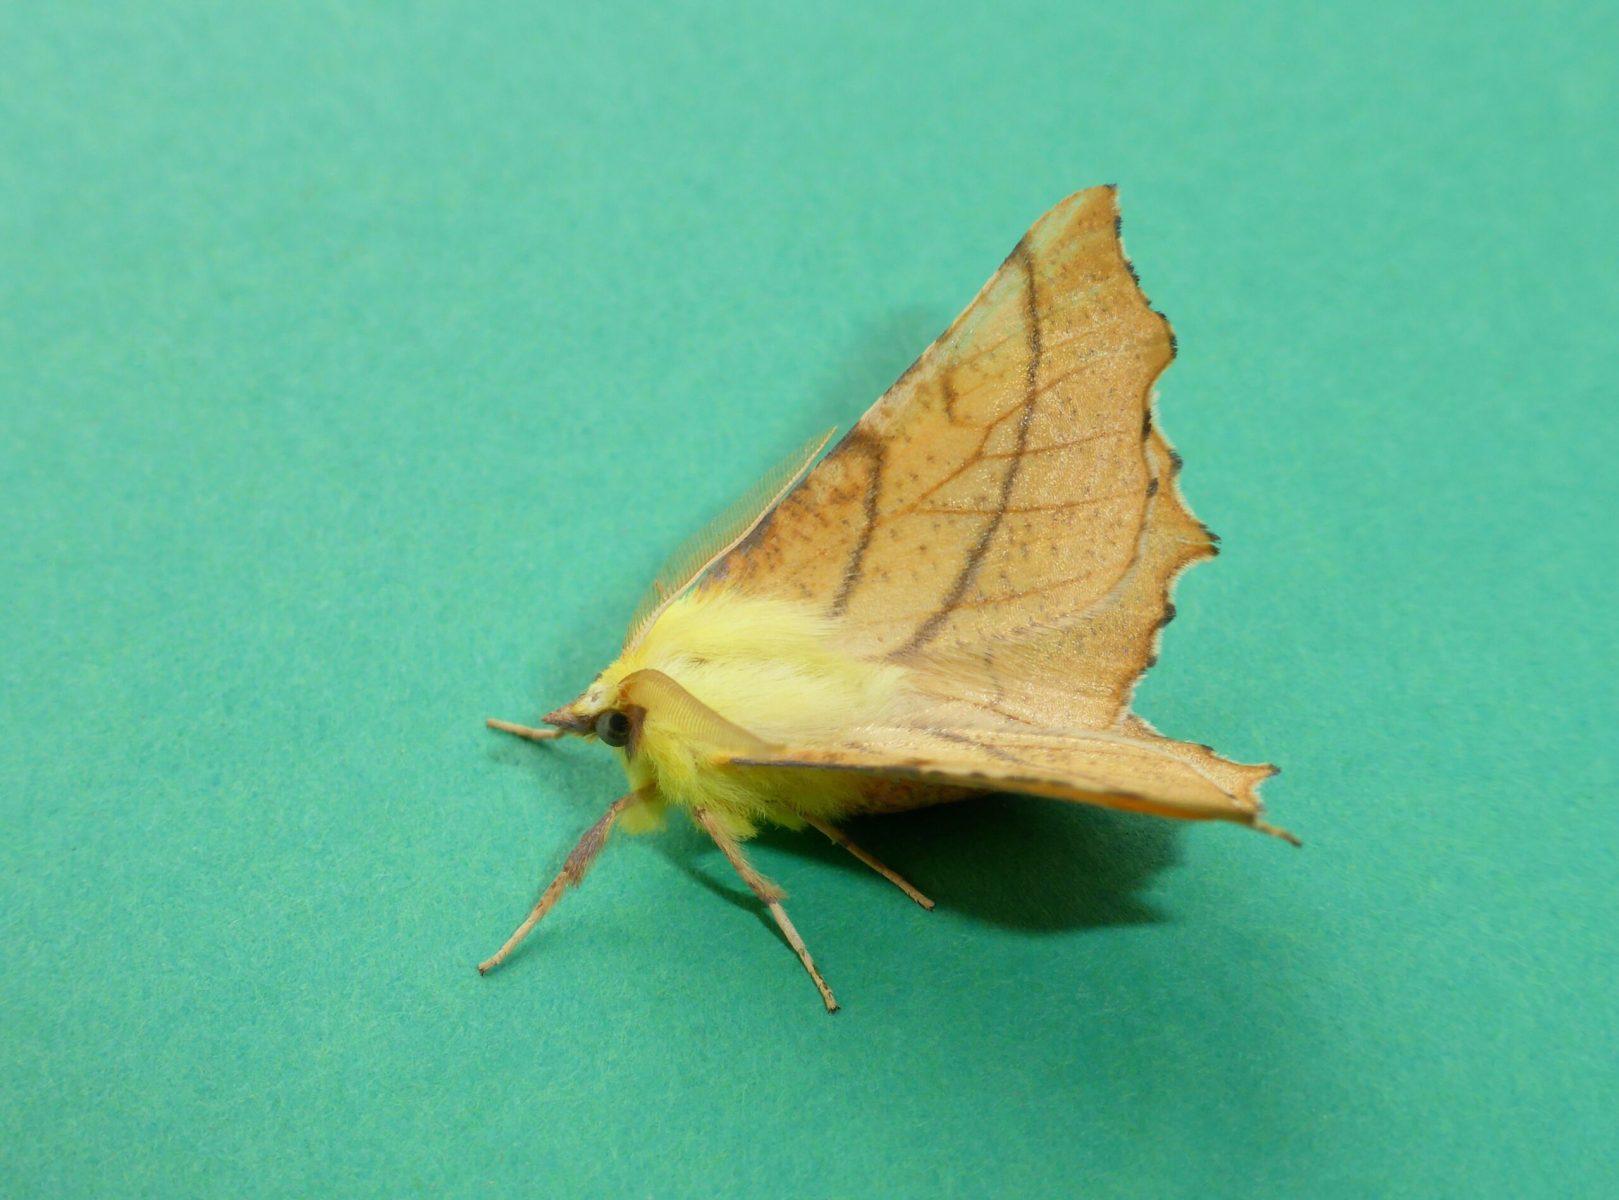 Ennomos ainiaria - Canary-shouldered Thorn - Kirk Smeaton